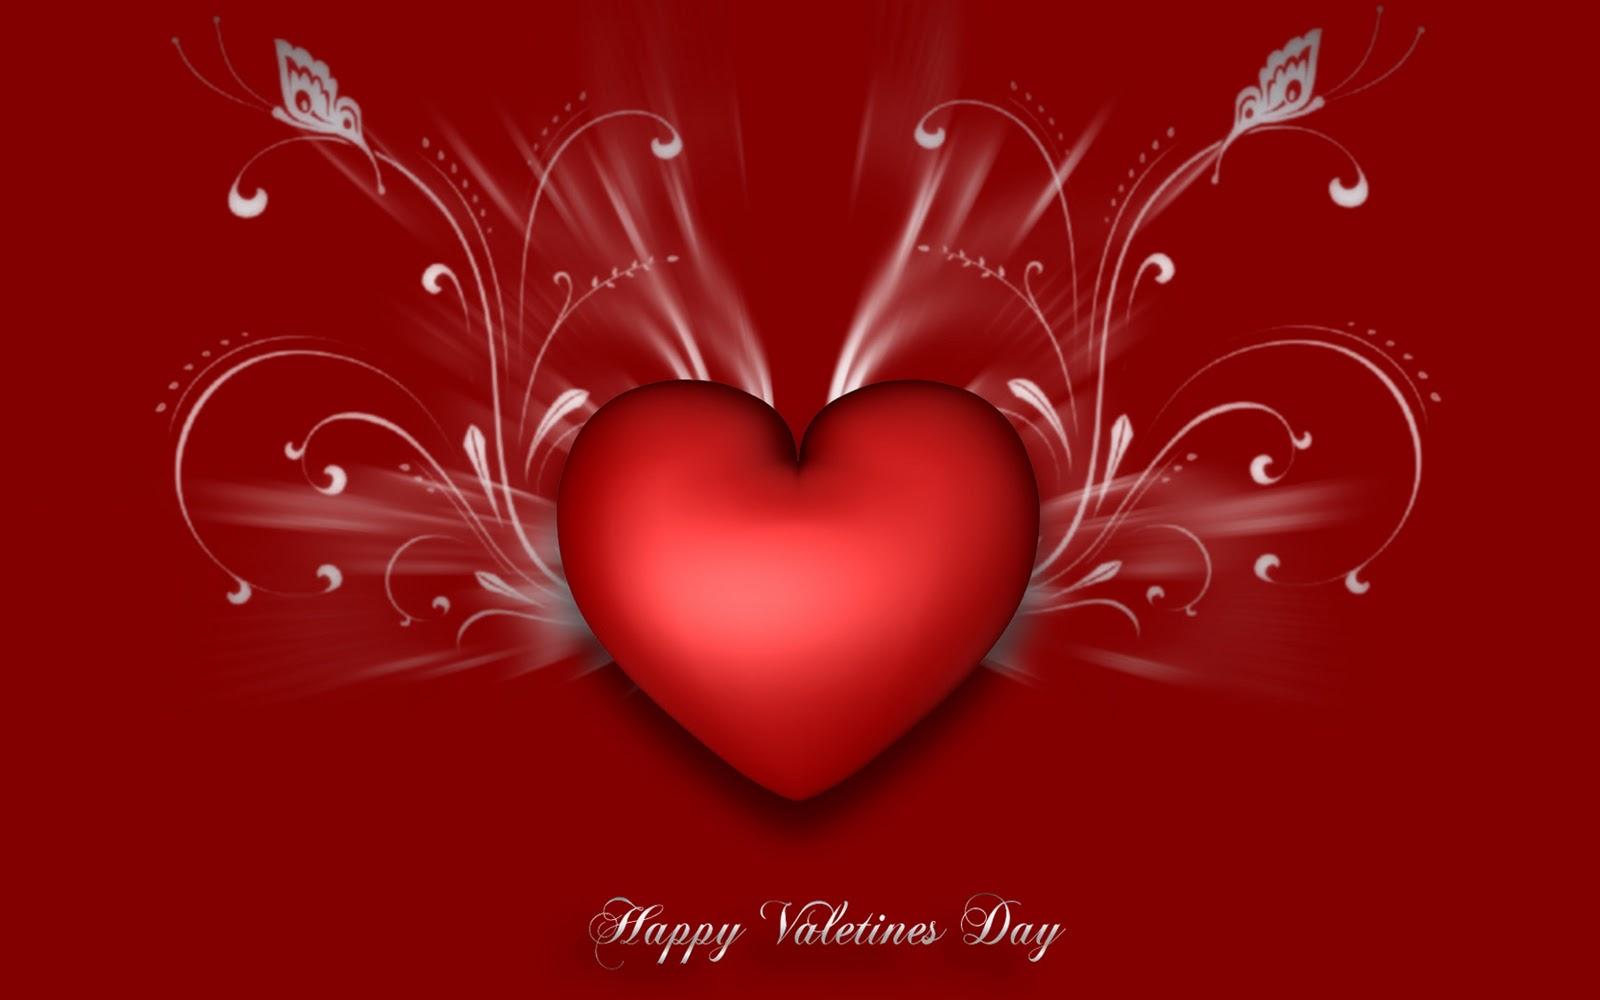 valentine wallpaper valentines wallpaper valentines day wallpaper 1600x1000